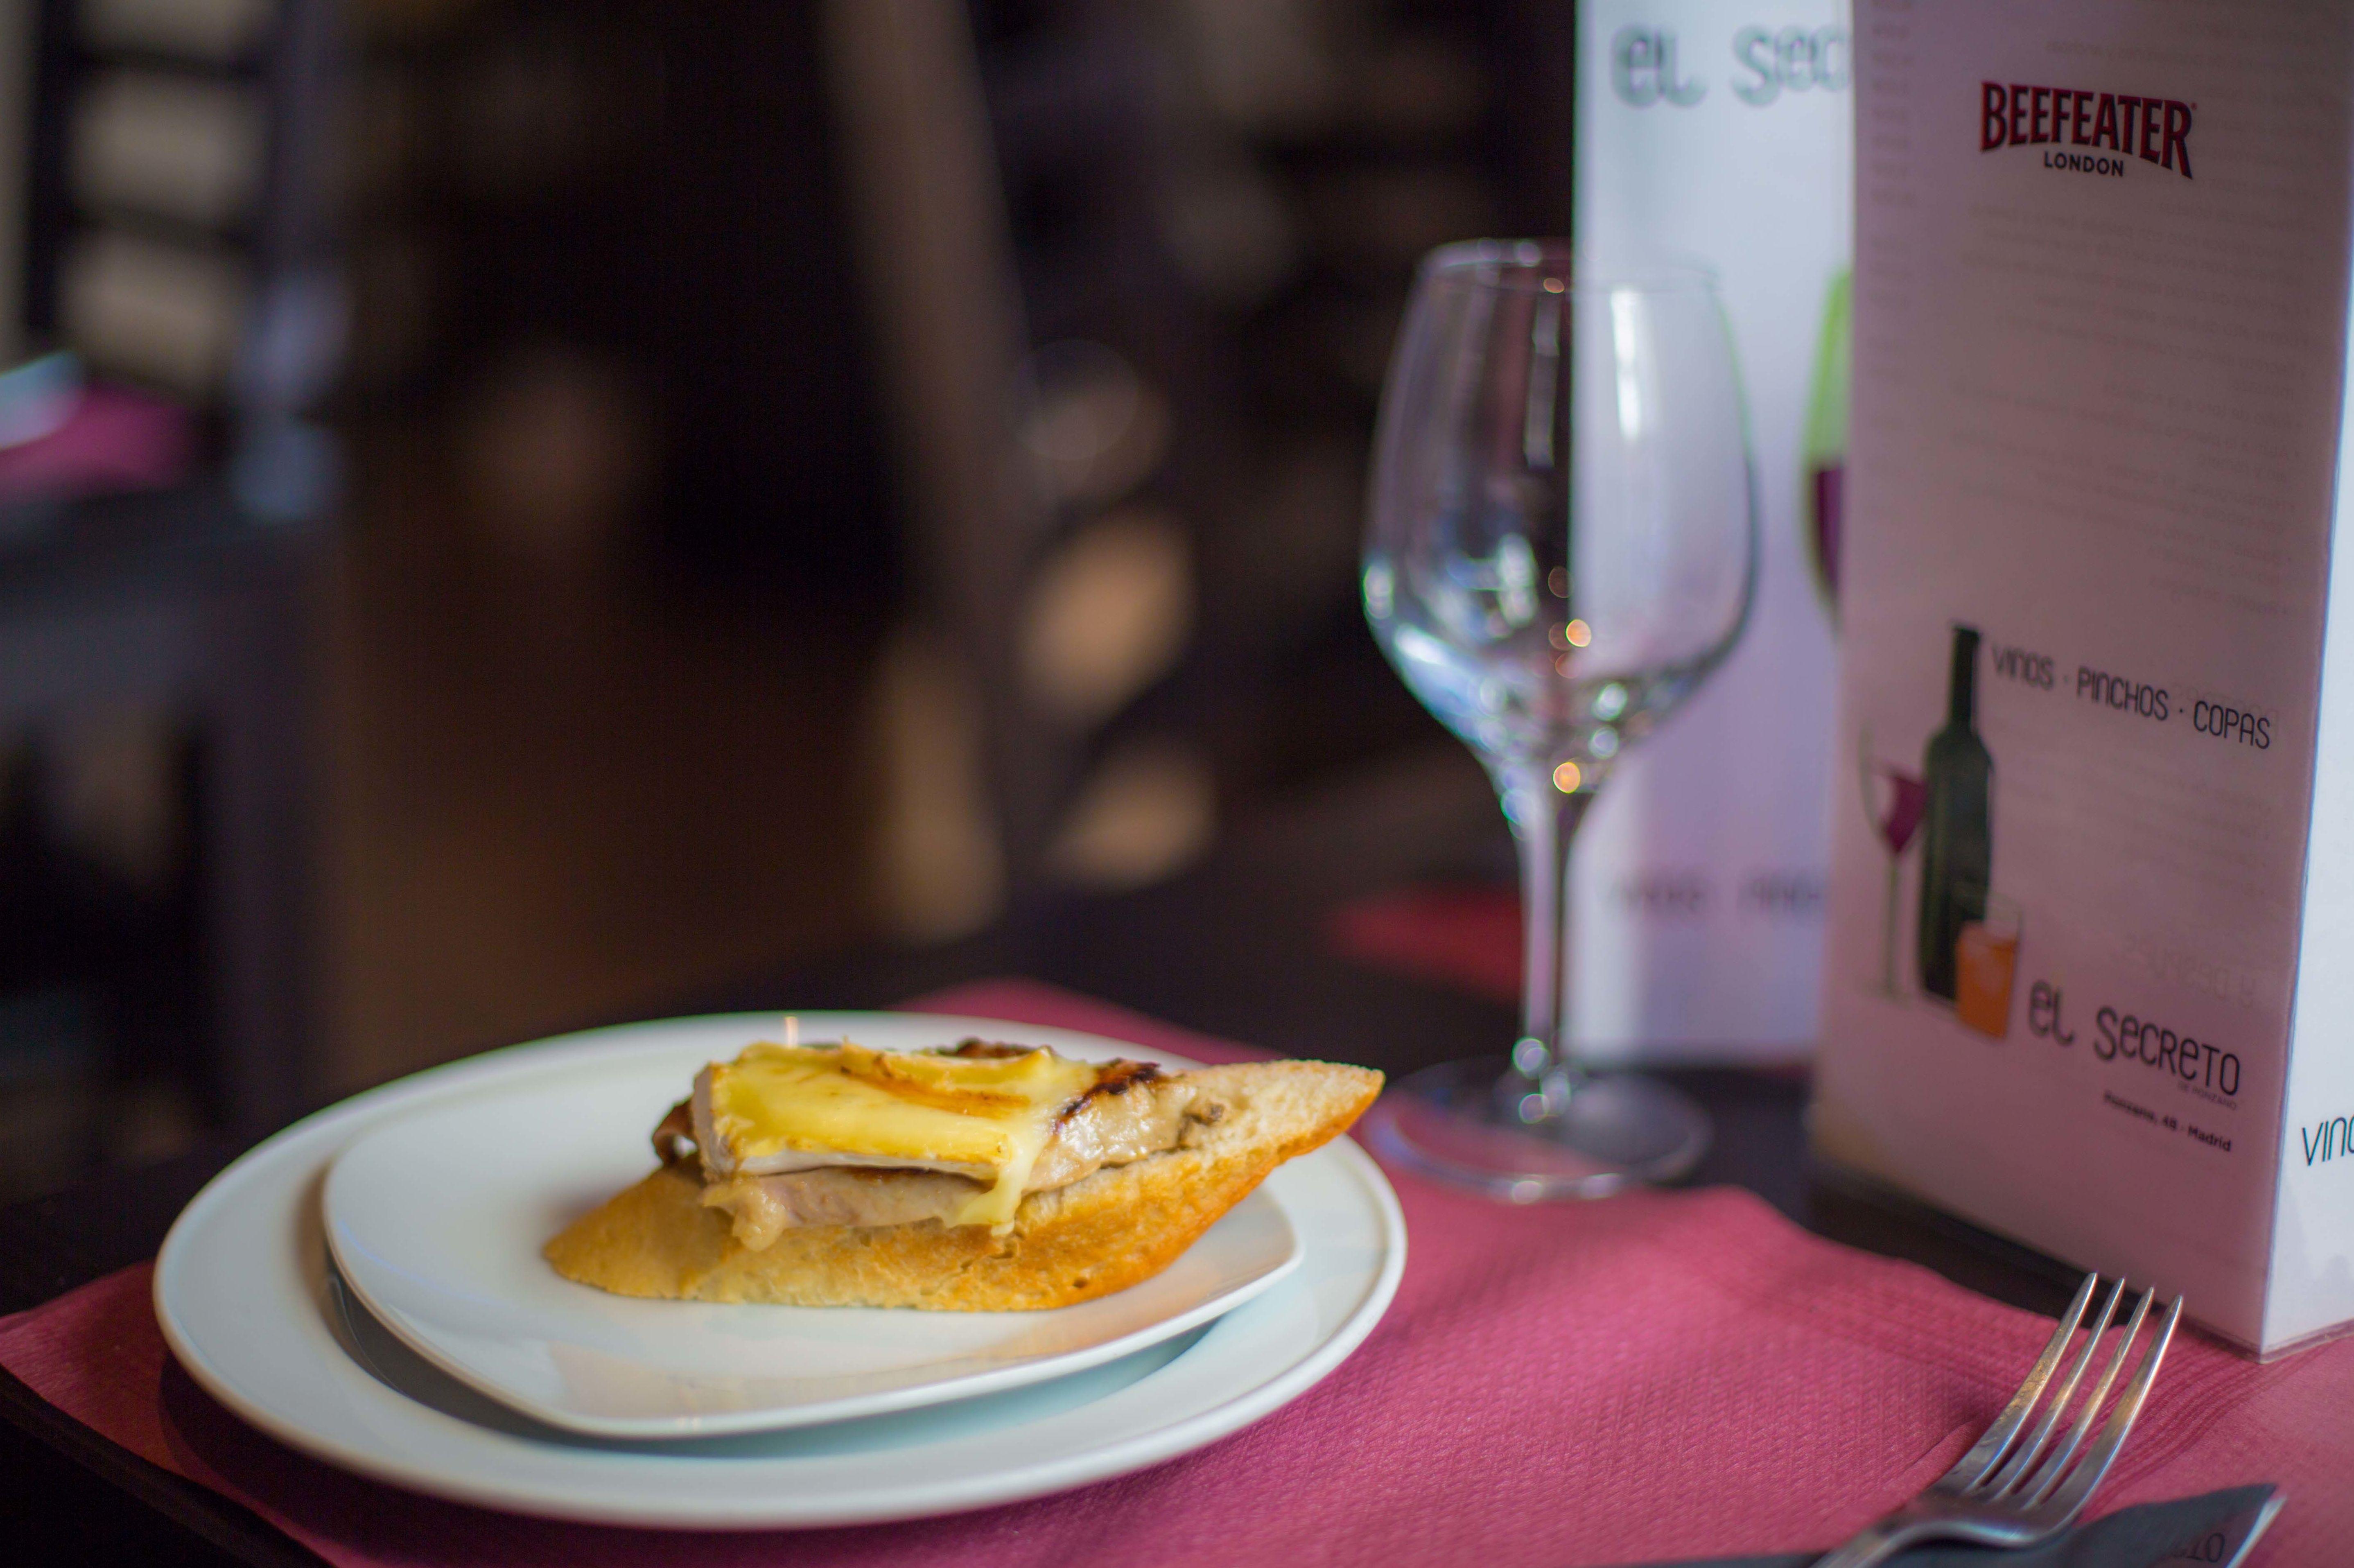 Pincho caliente de solomillo de cerdo a la plancha con queso brie